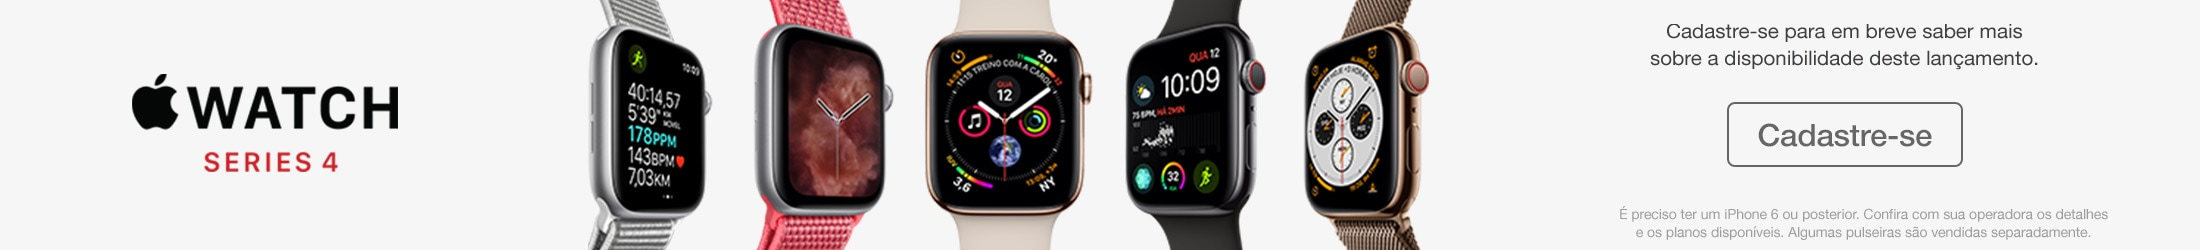 Banner do Apple Watch Series 4